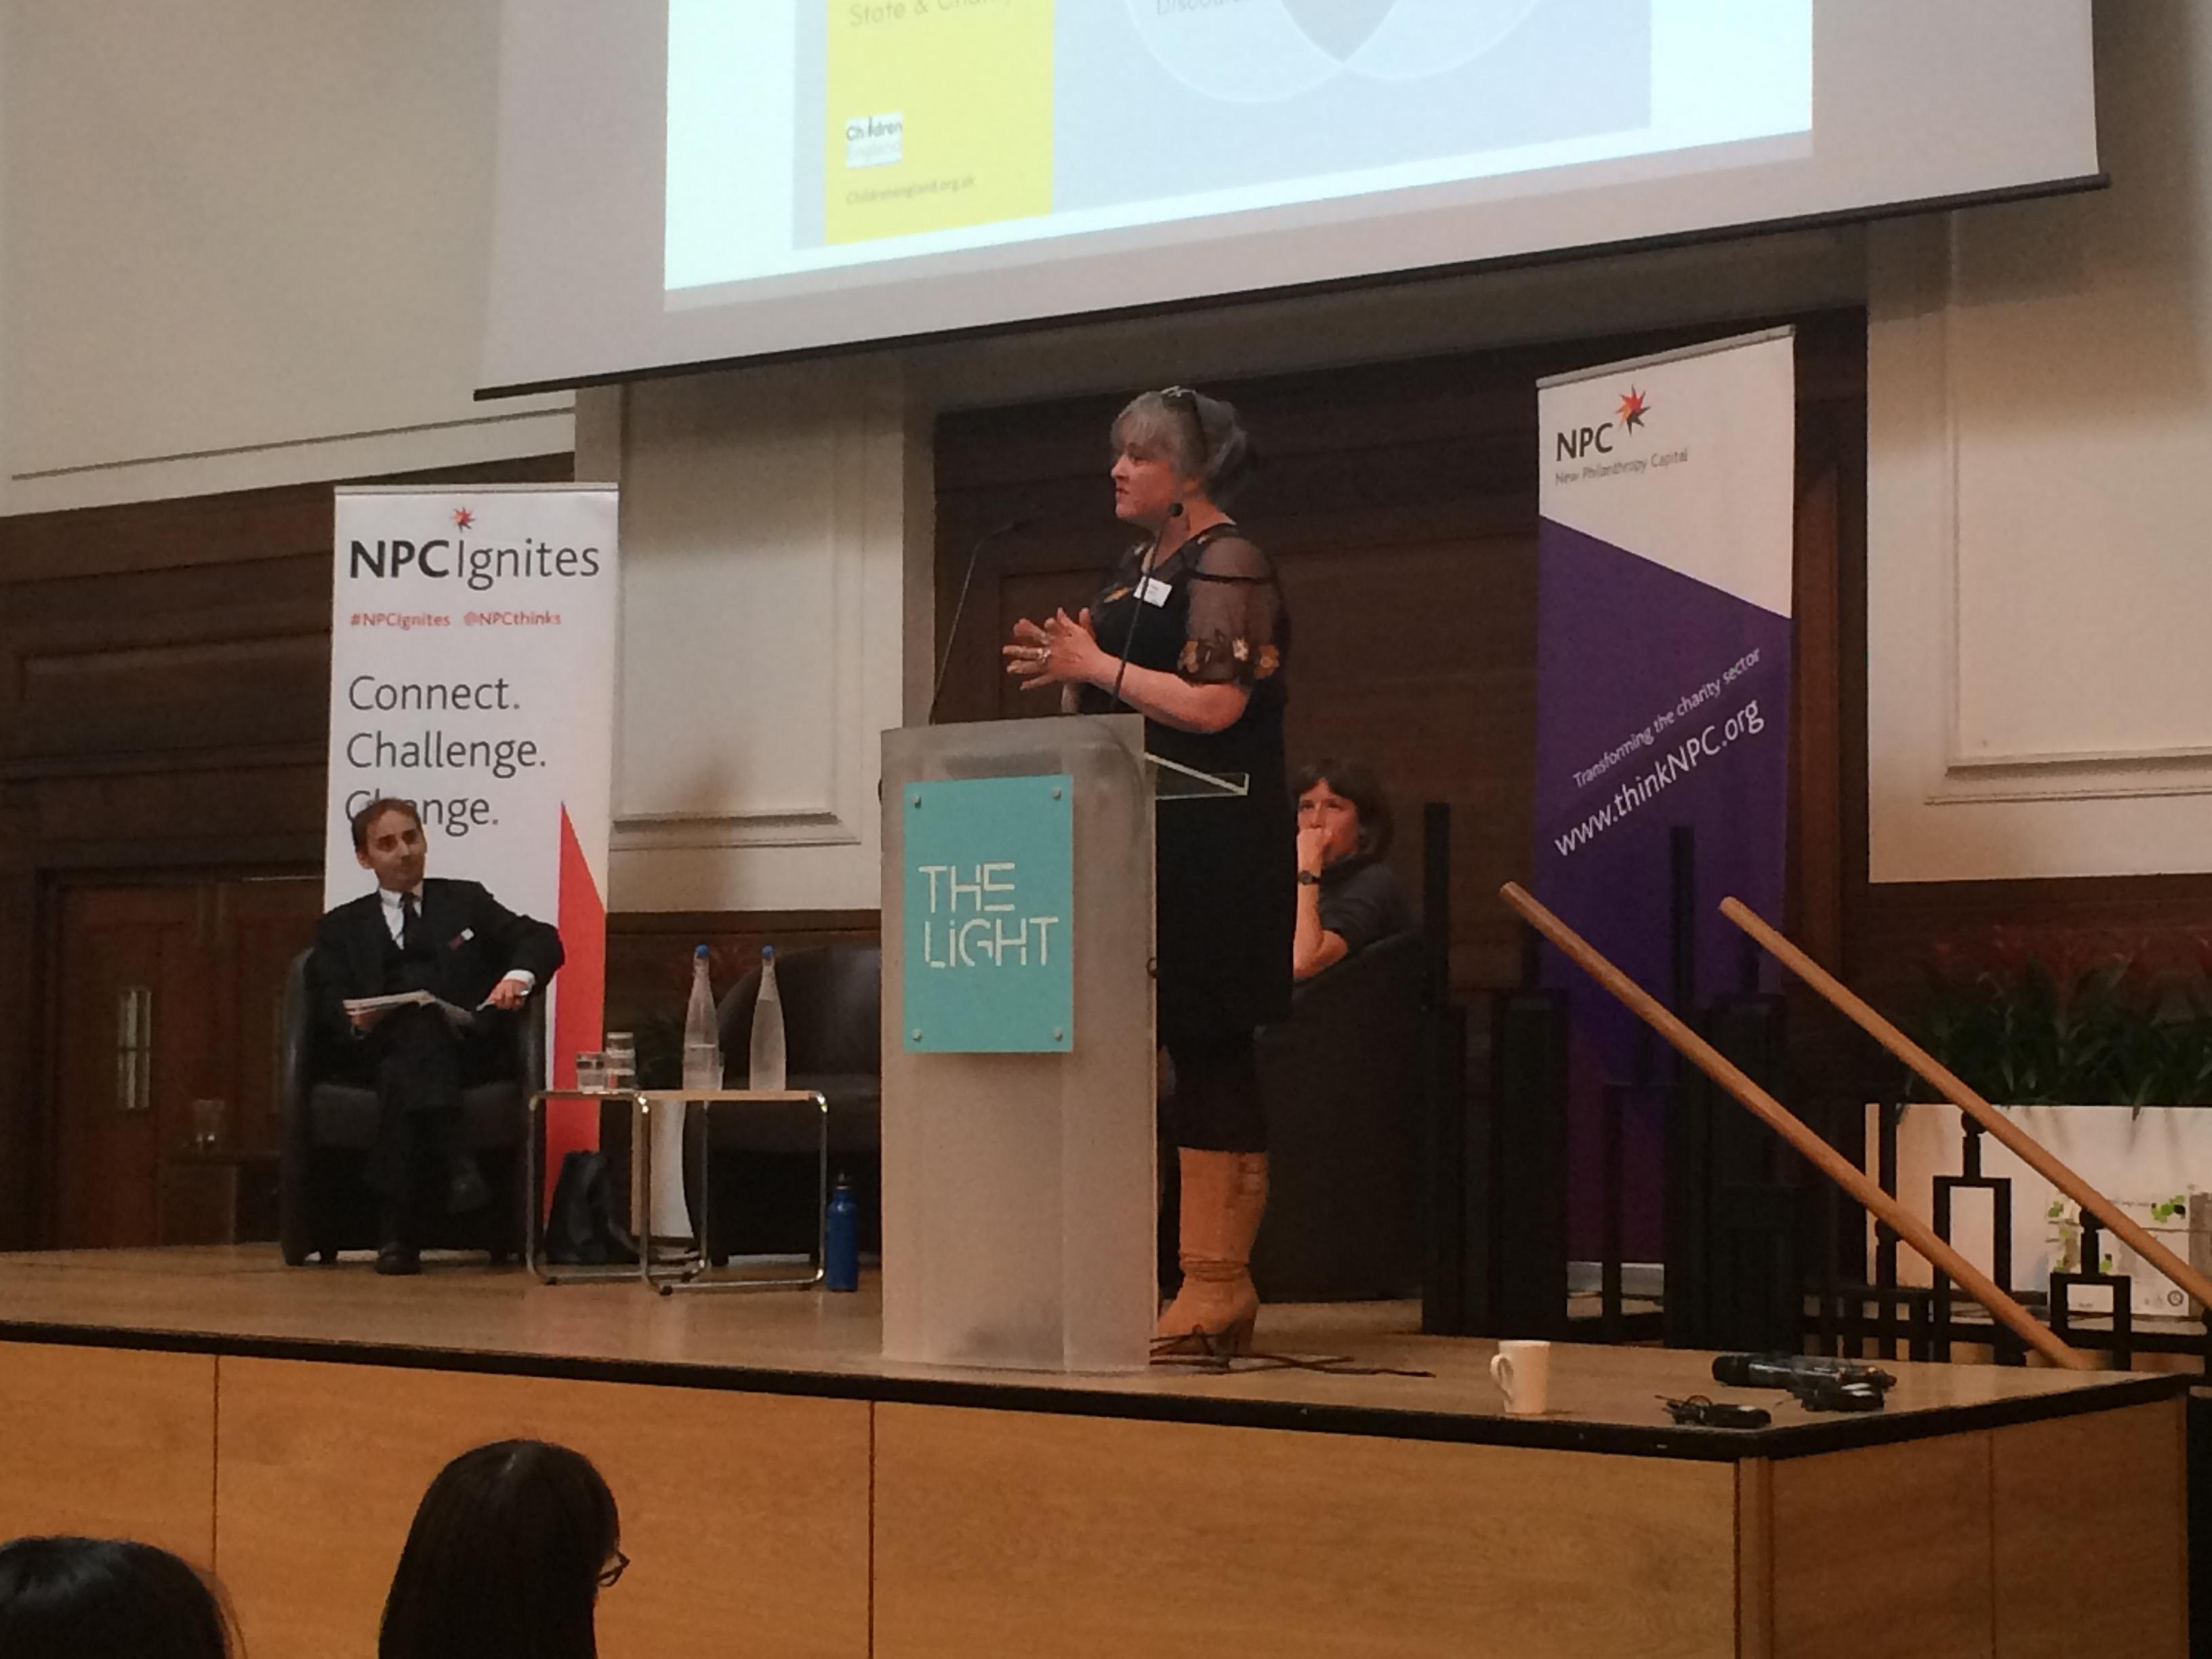 Kathy Evans addresses NPC Ignites audience